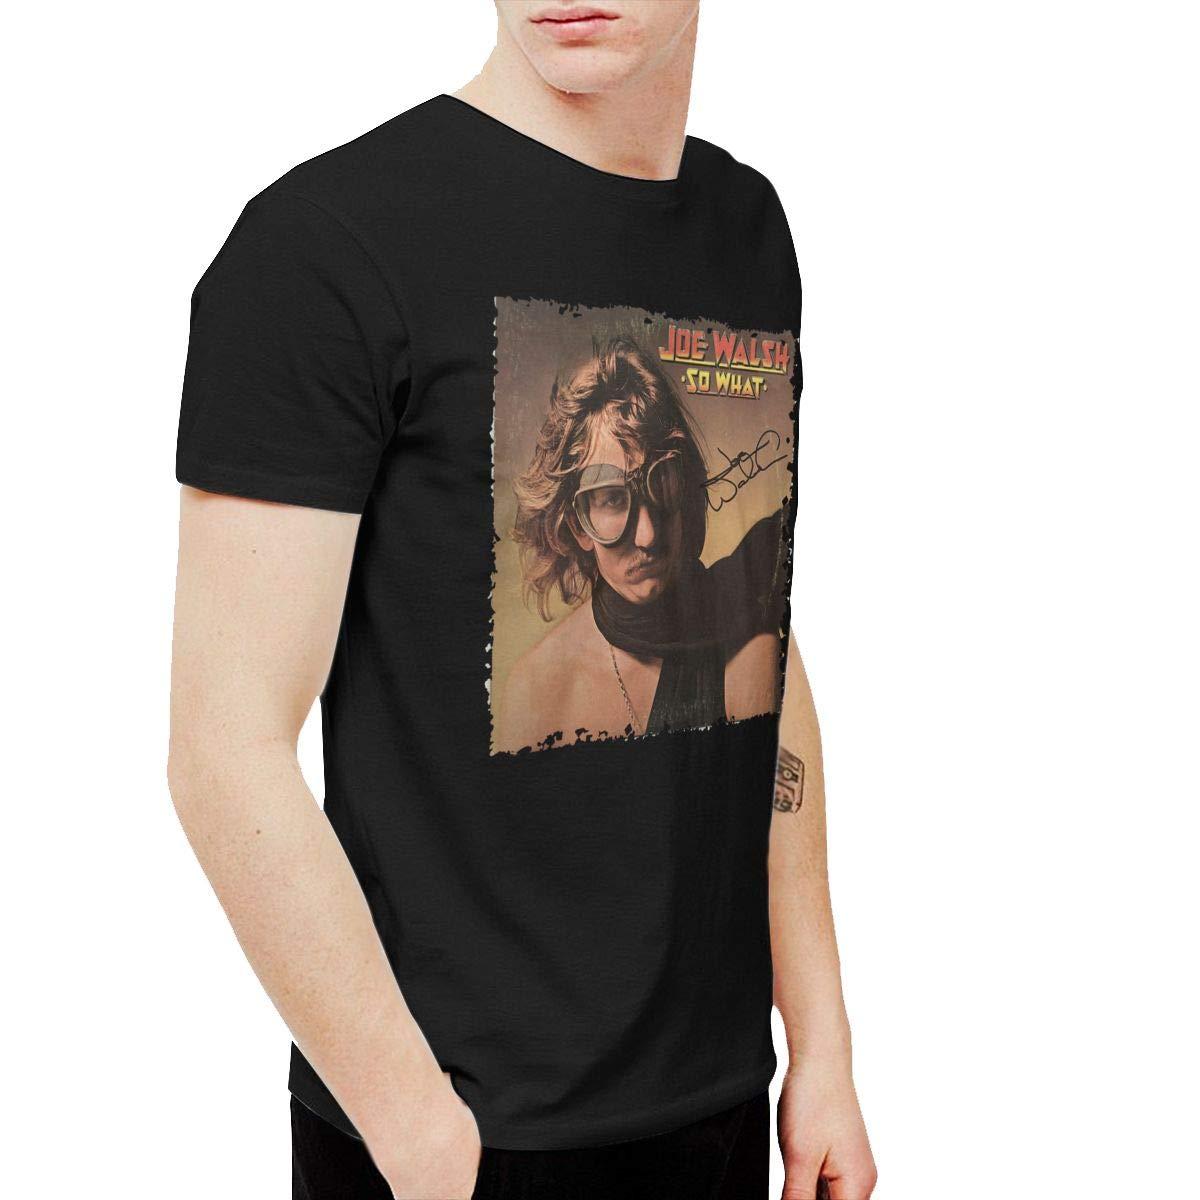 XLBSFJIWVD Joe Walsh So What Mens Short Sleeve T-Shirt Black